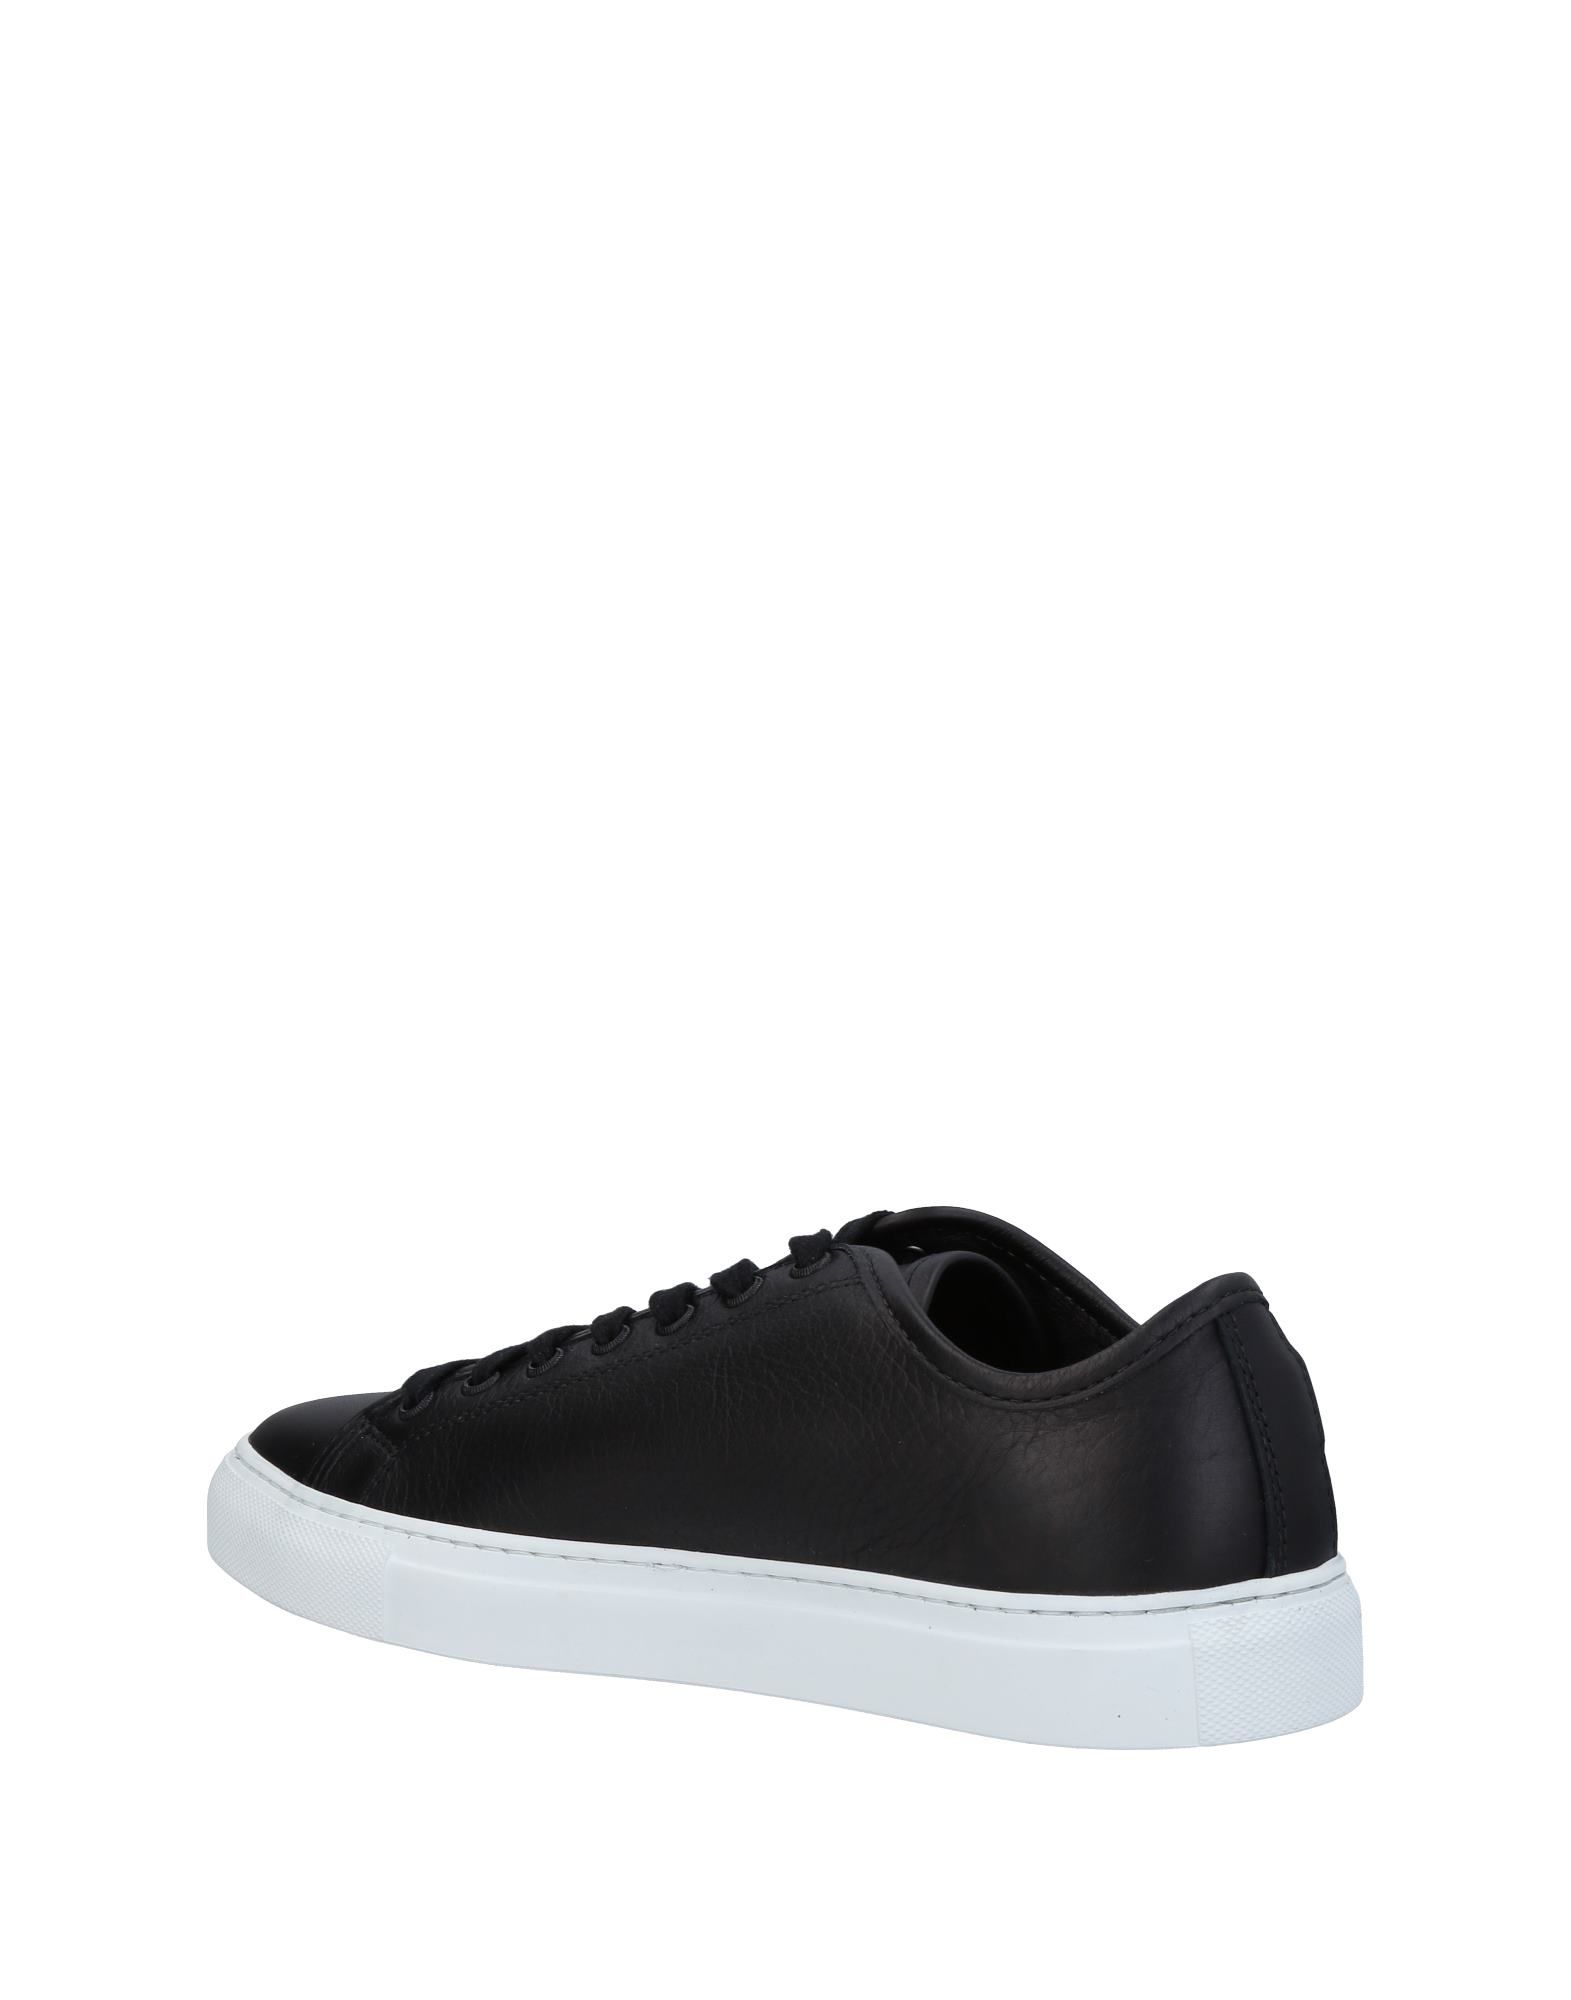 Diemme Sneakers - Men Diemme Sneakers online online online on  Australia - 11223796JQ 420c42